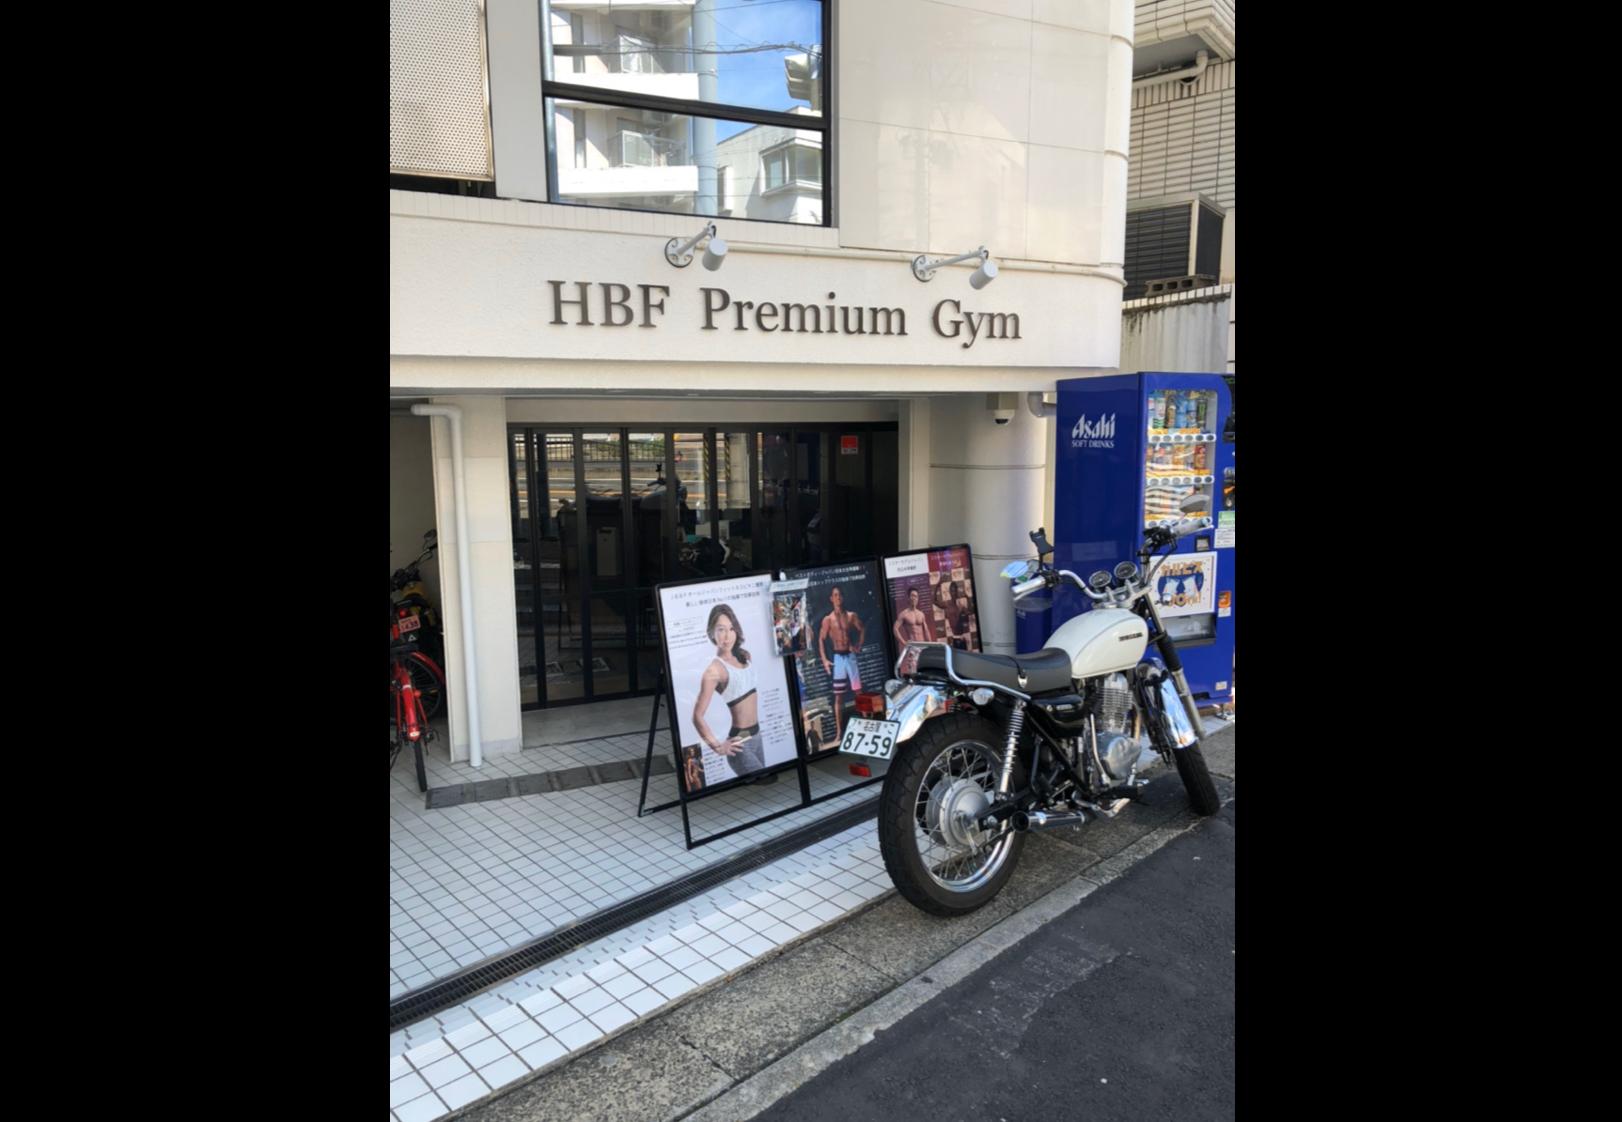 HBF(Healthy Beauty Fitness)パーソナルトレーニングジム八事店 イメージ画像